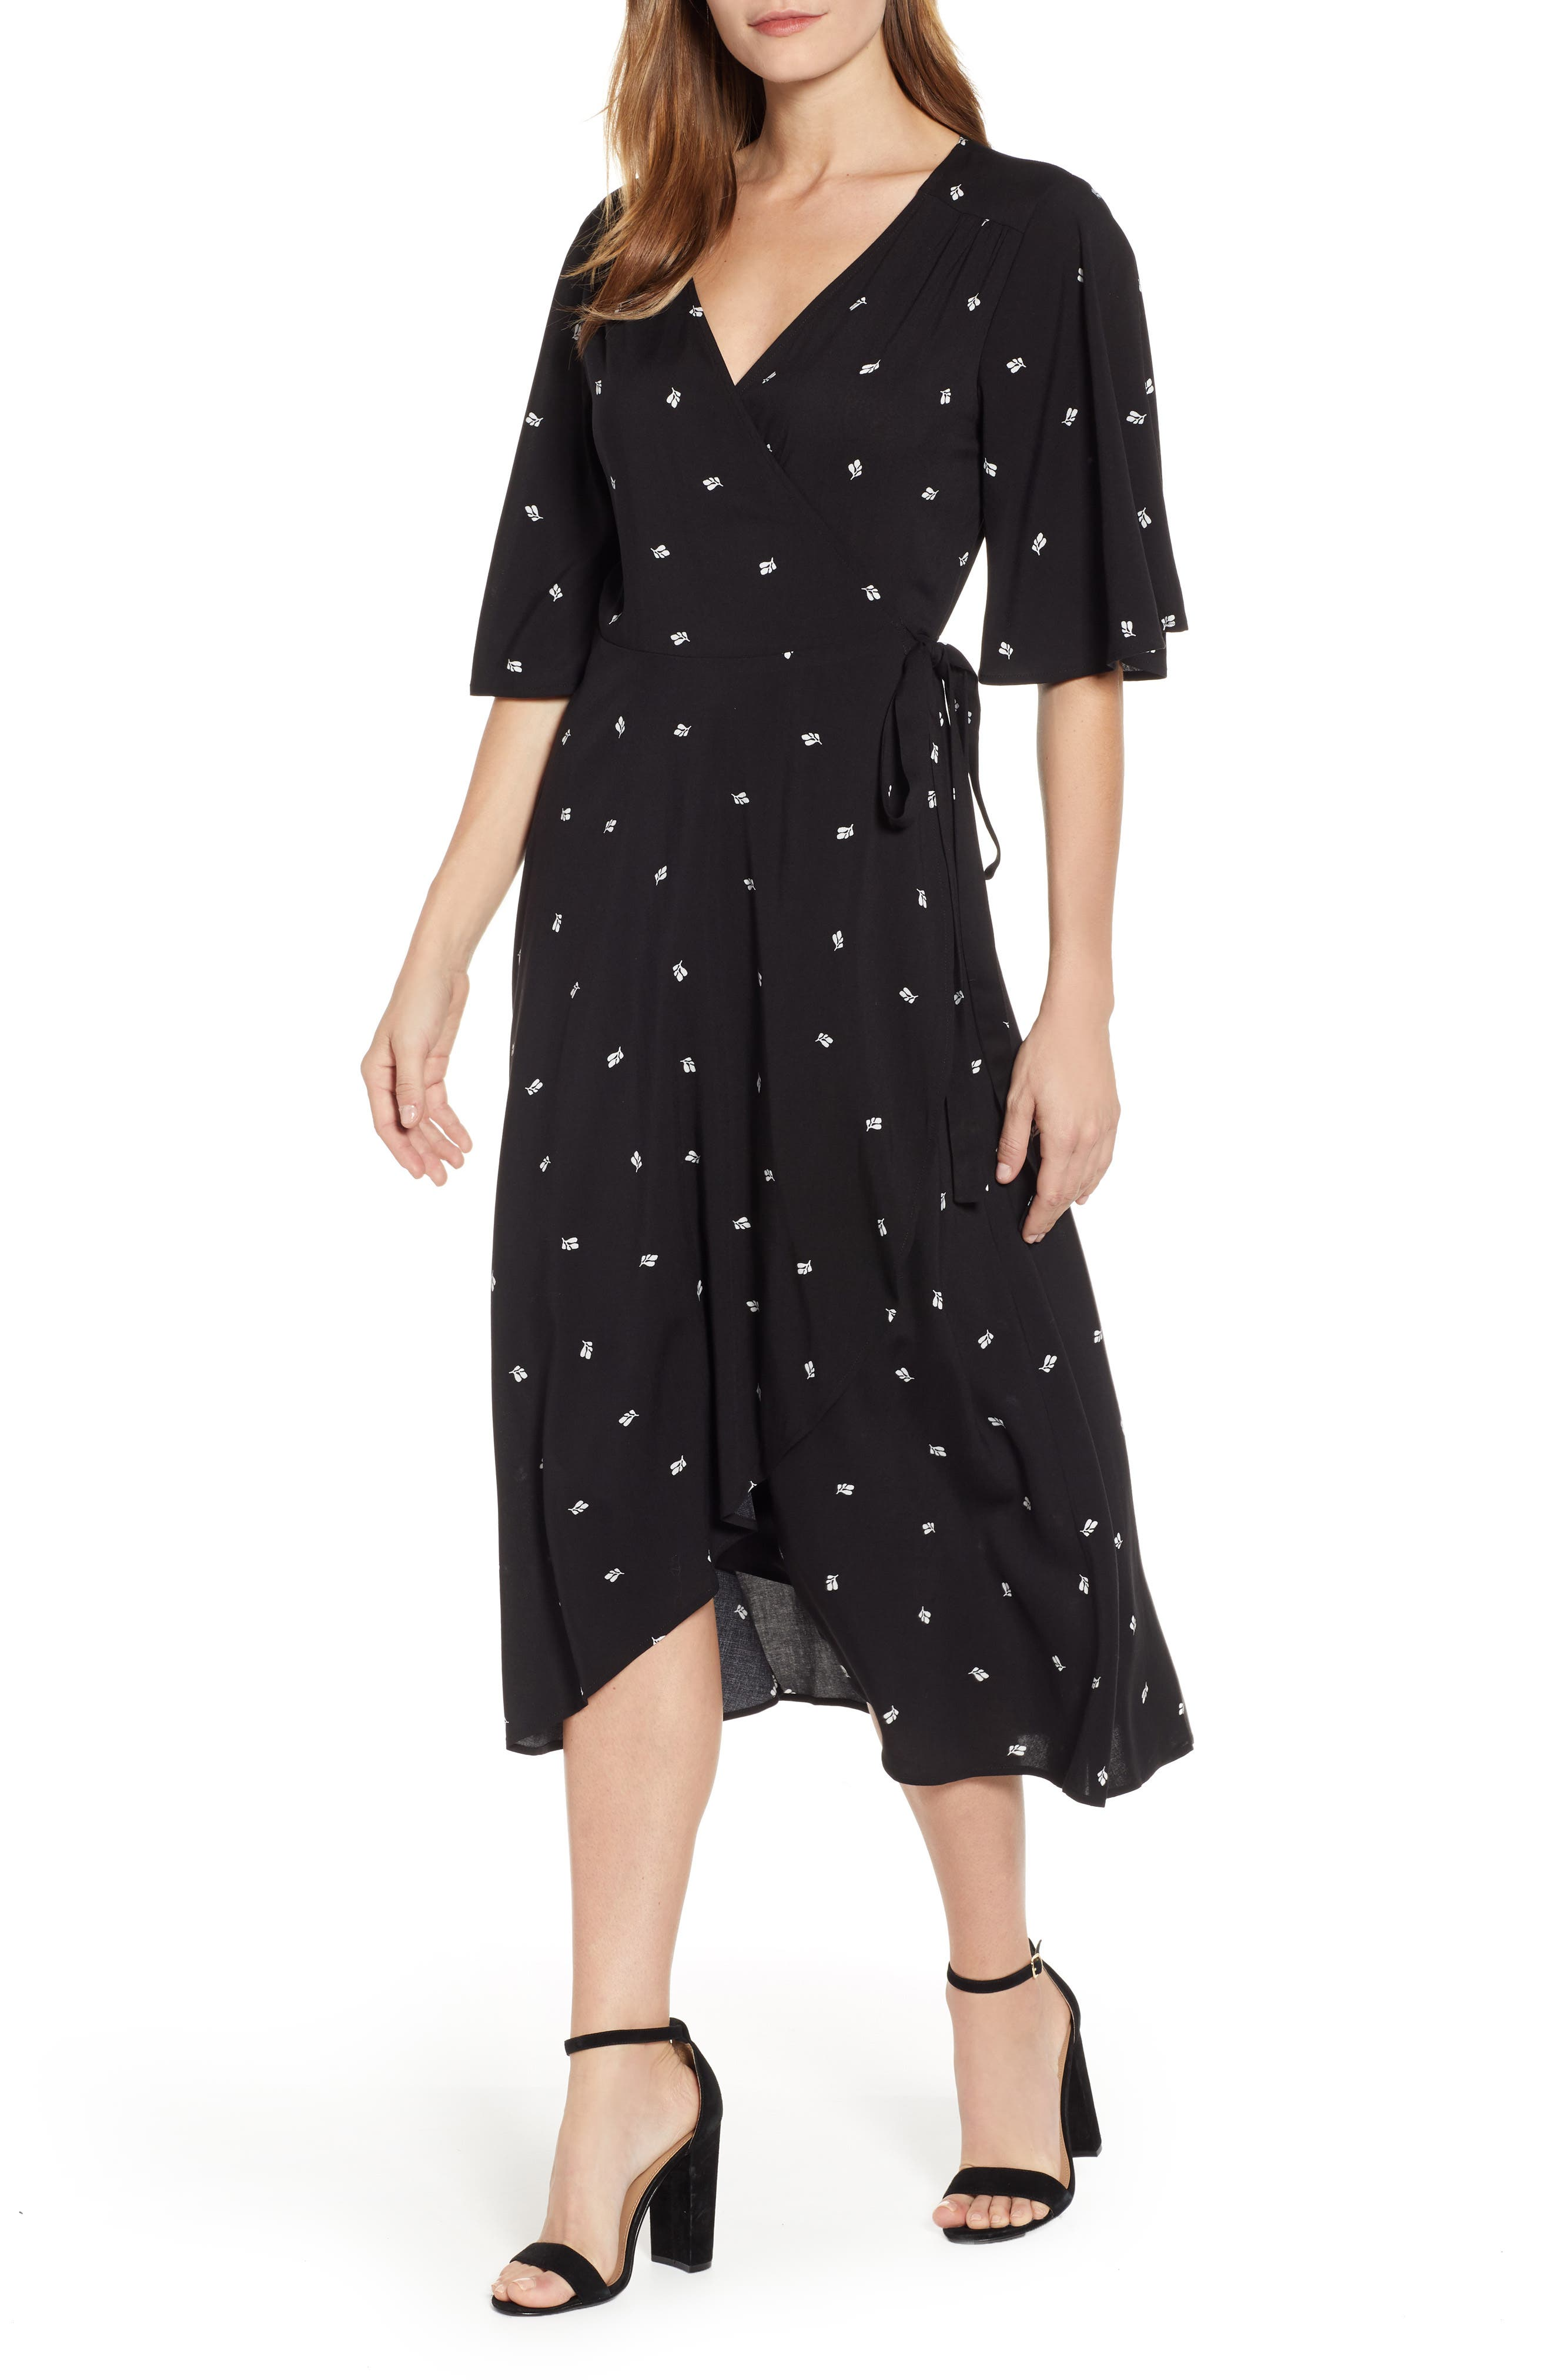 BOBEAU, Orna High/Low Wrap Dress, Main thumbnail 1, color, BLACK LEAF PRINT